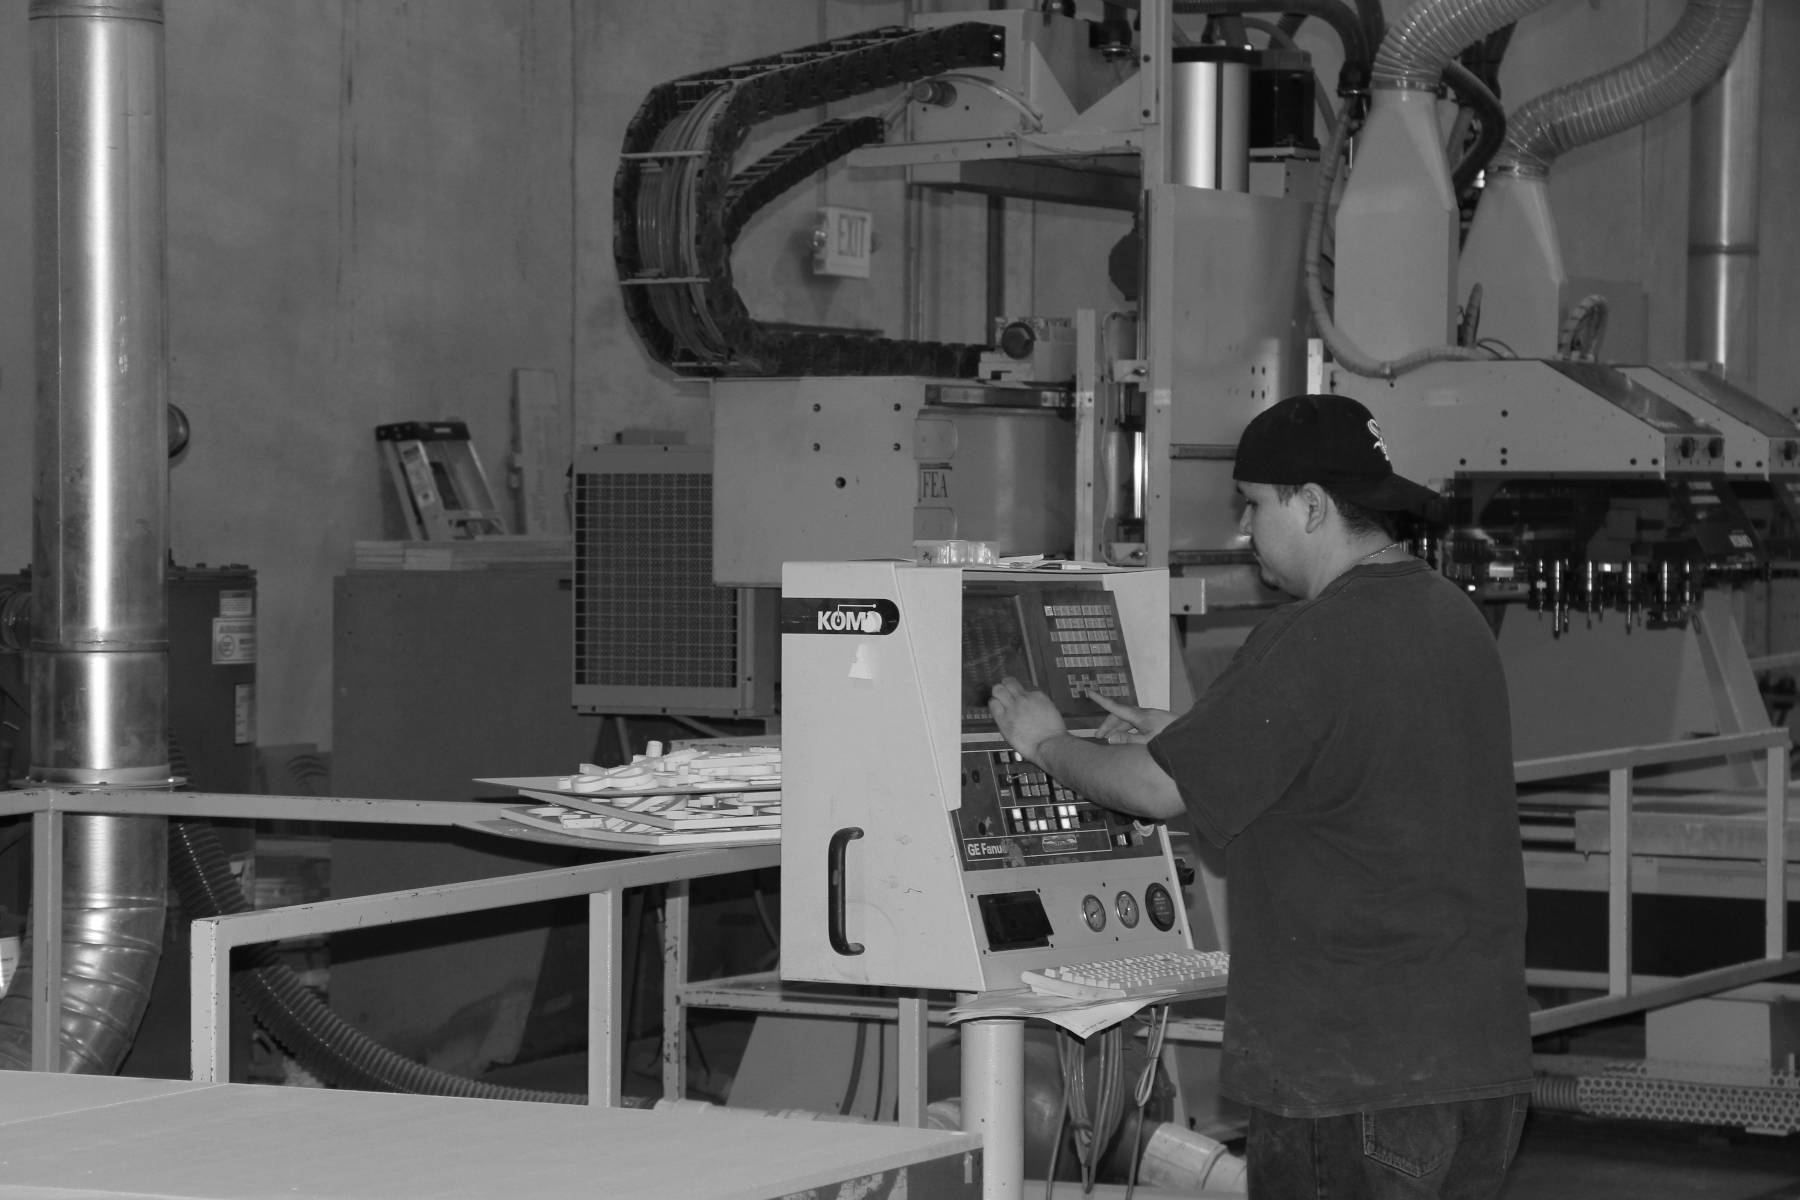 https://mw-sf.com/wp-content/uploads/2019/11/wood-manufacturing-01.jpg